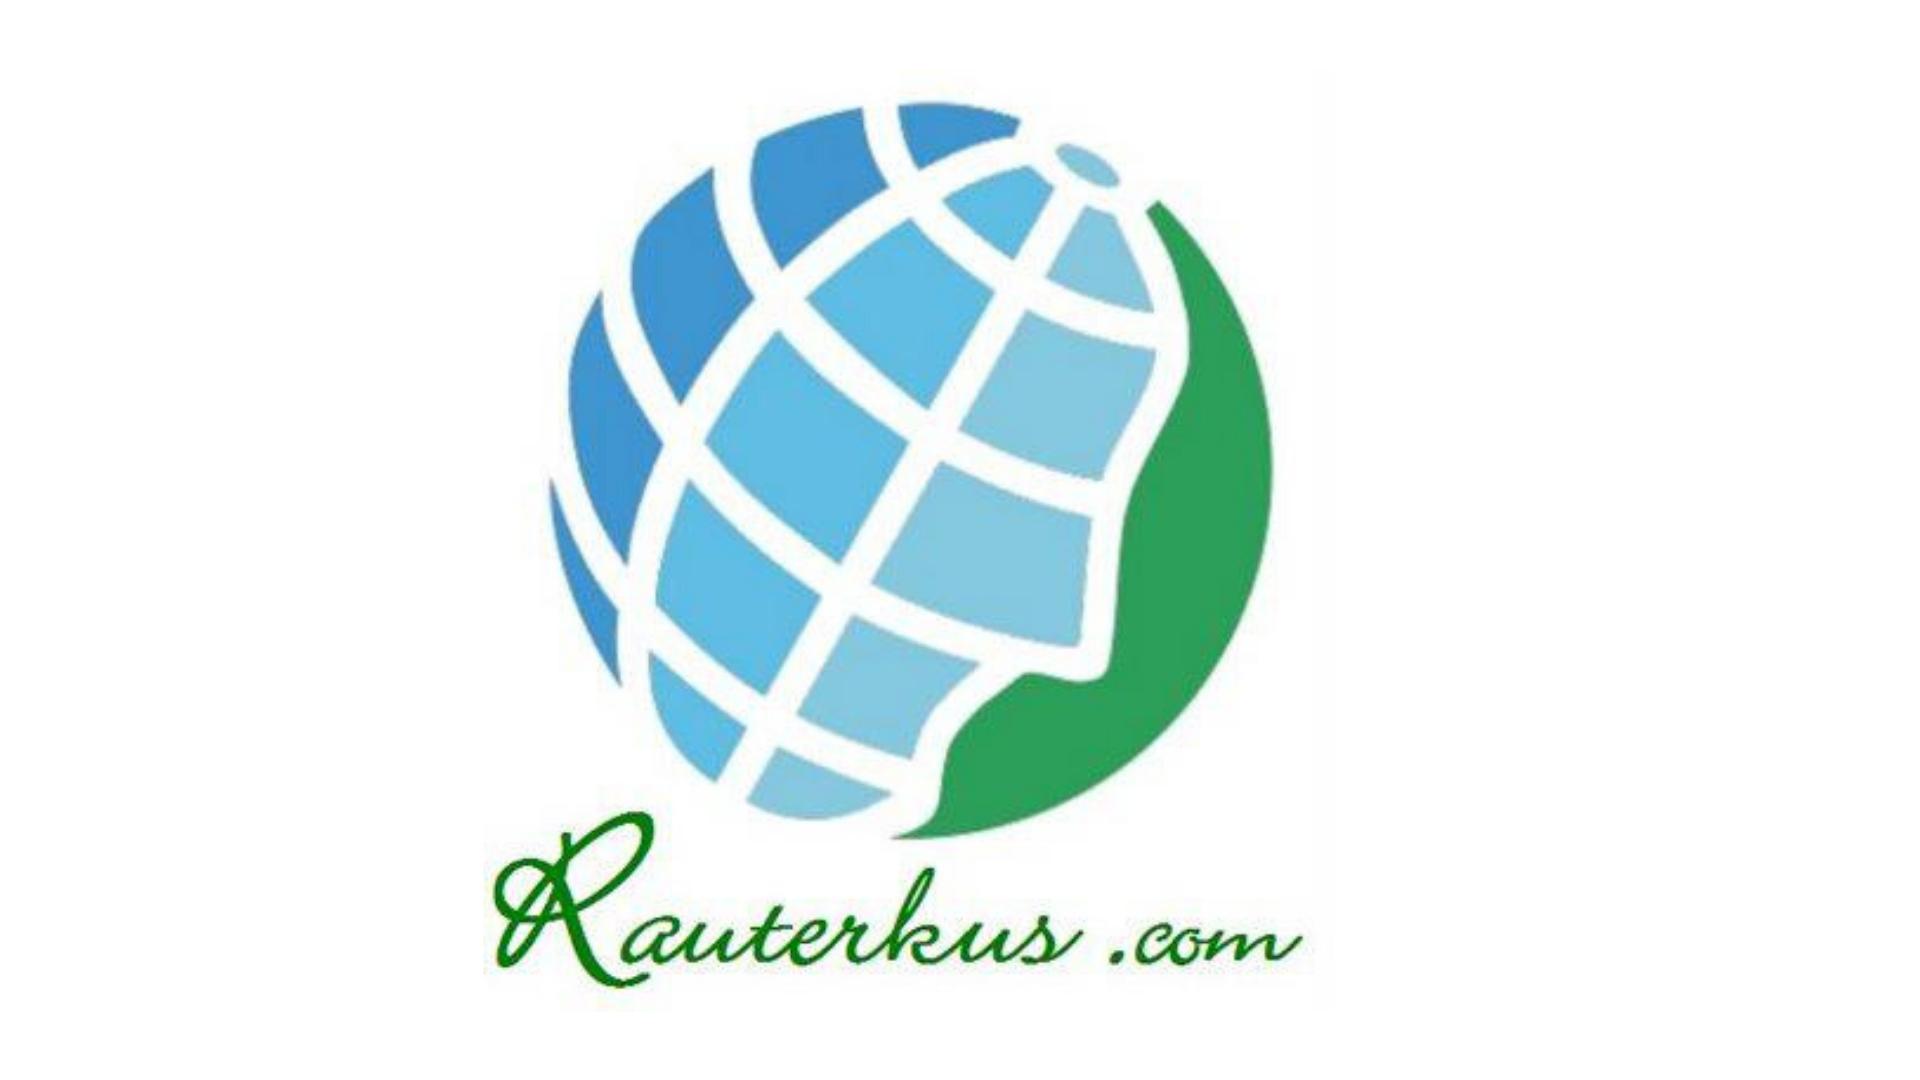 Rauterkus.com logo